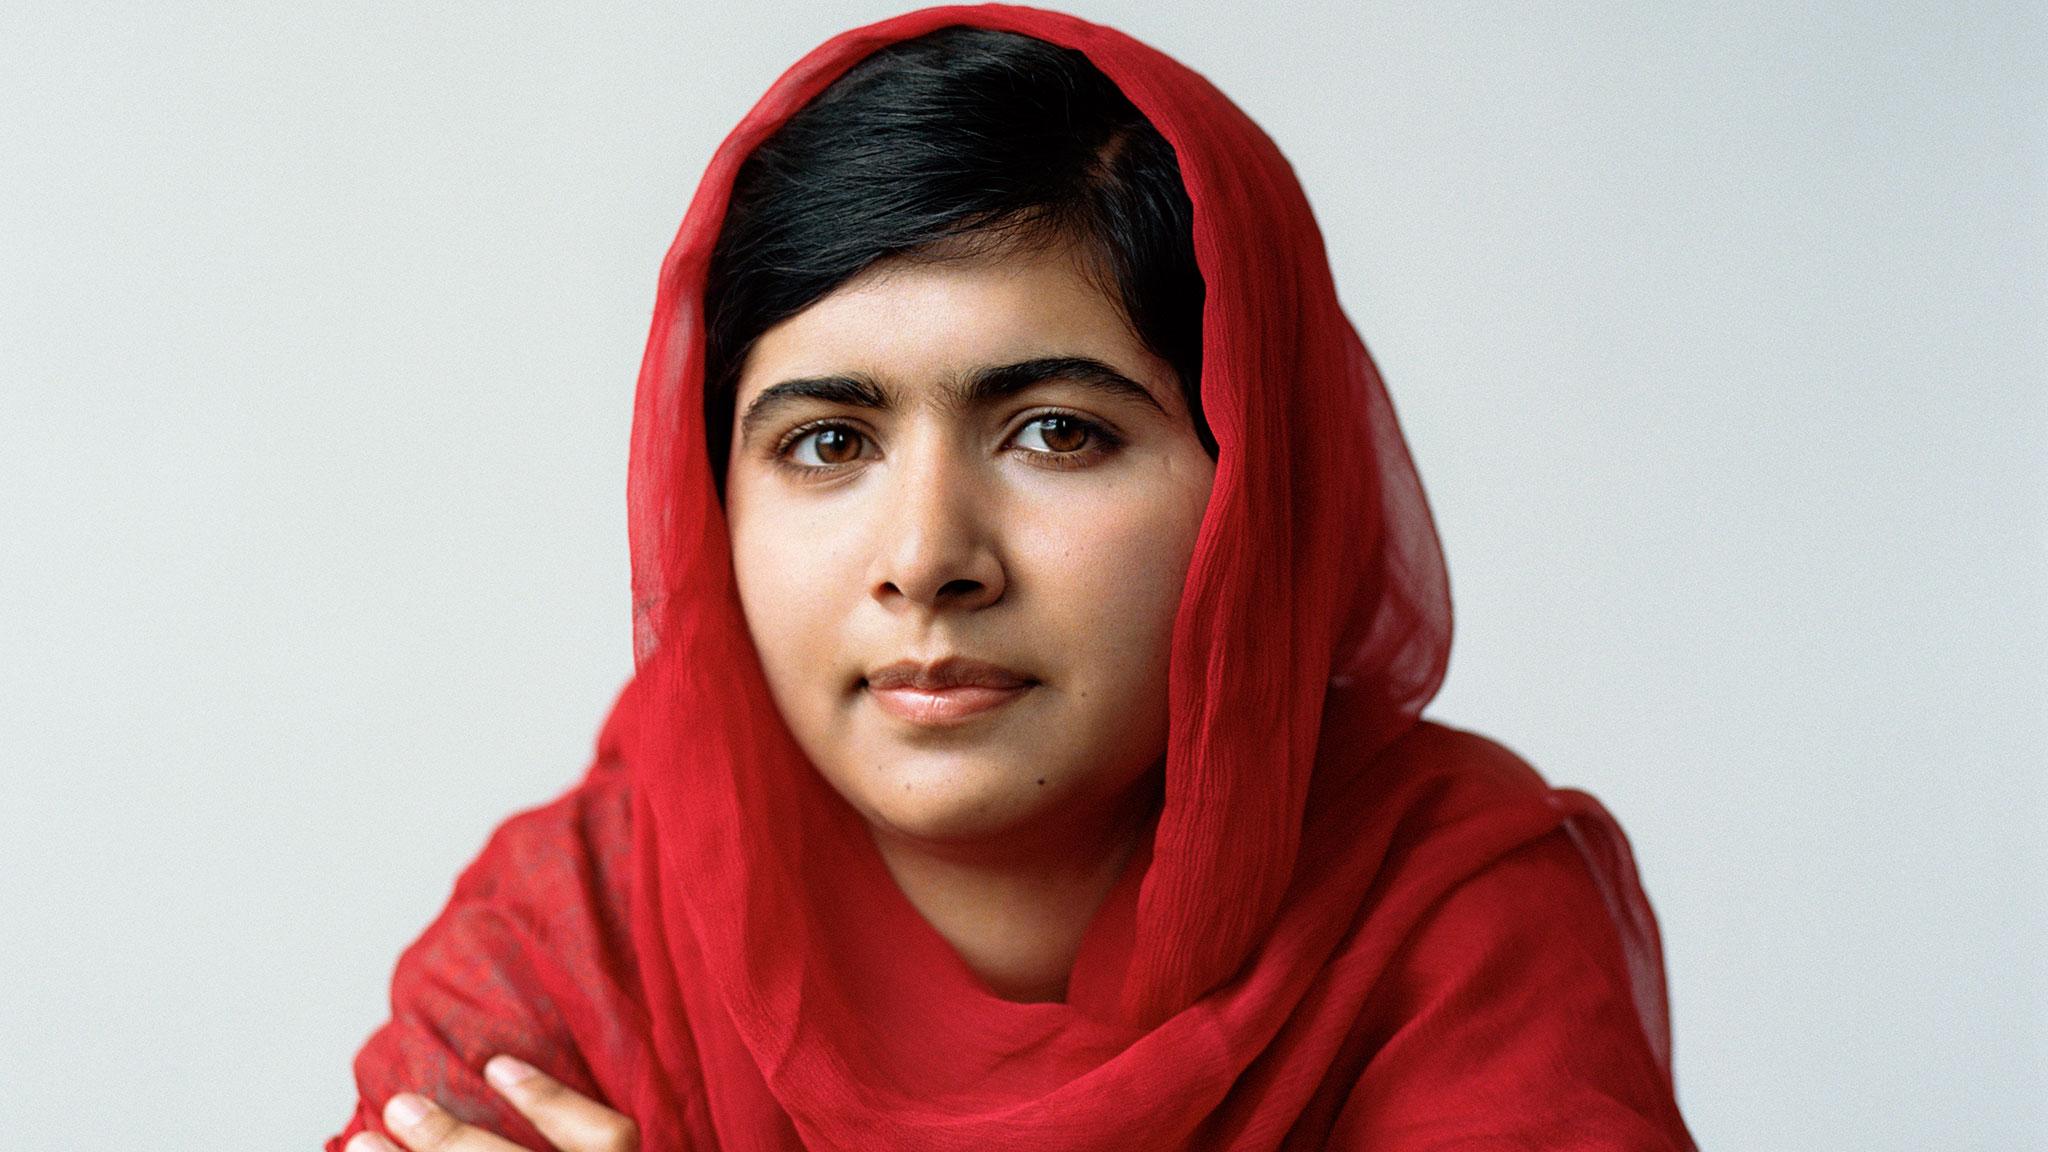 Malala Yousafzai Wallpaper 3   2048 X 1152 stmednet 2048x1152